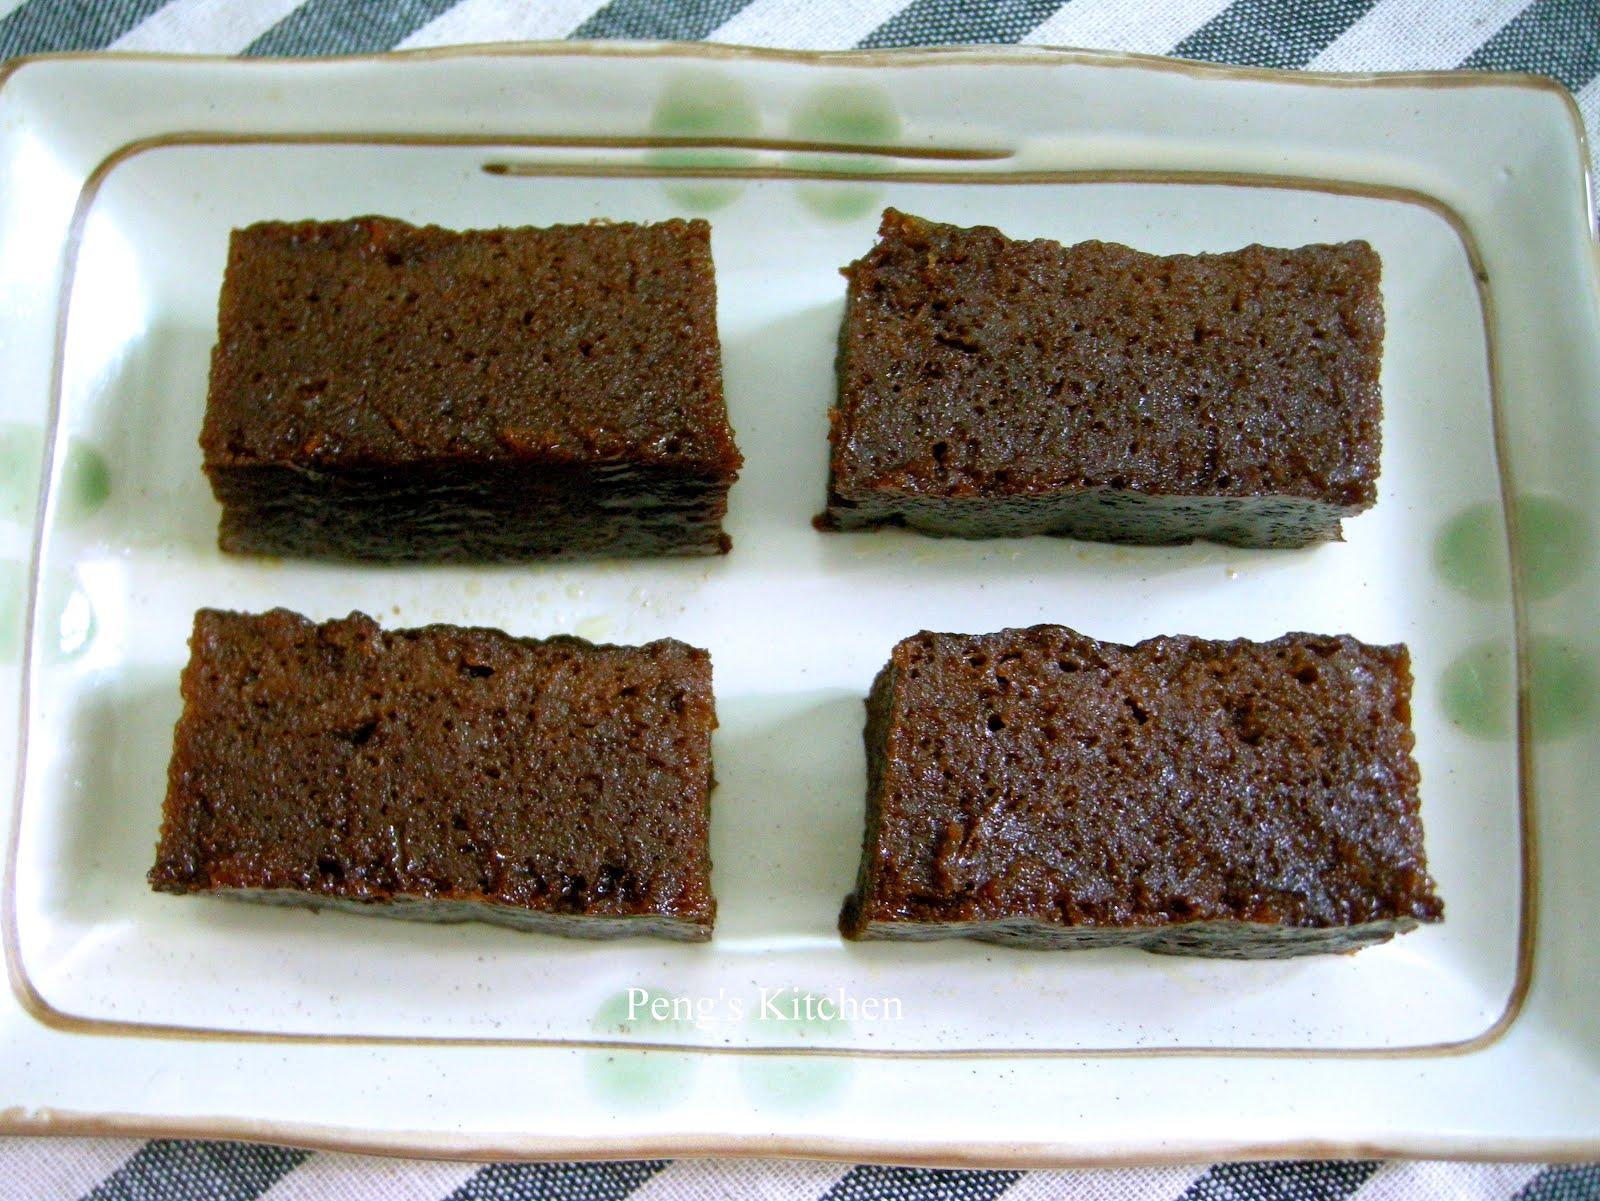 sarawak cake - photo #43